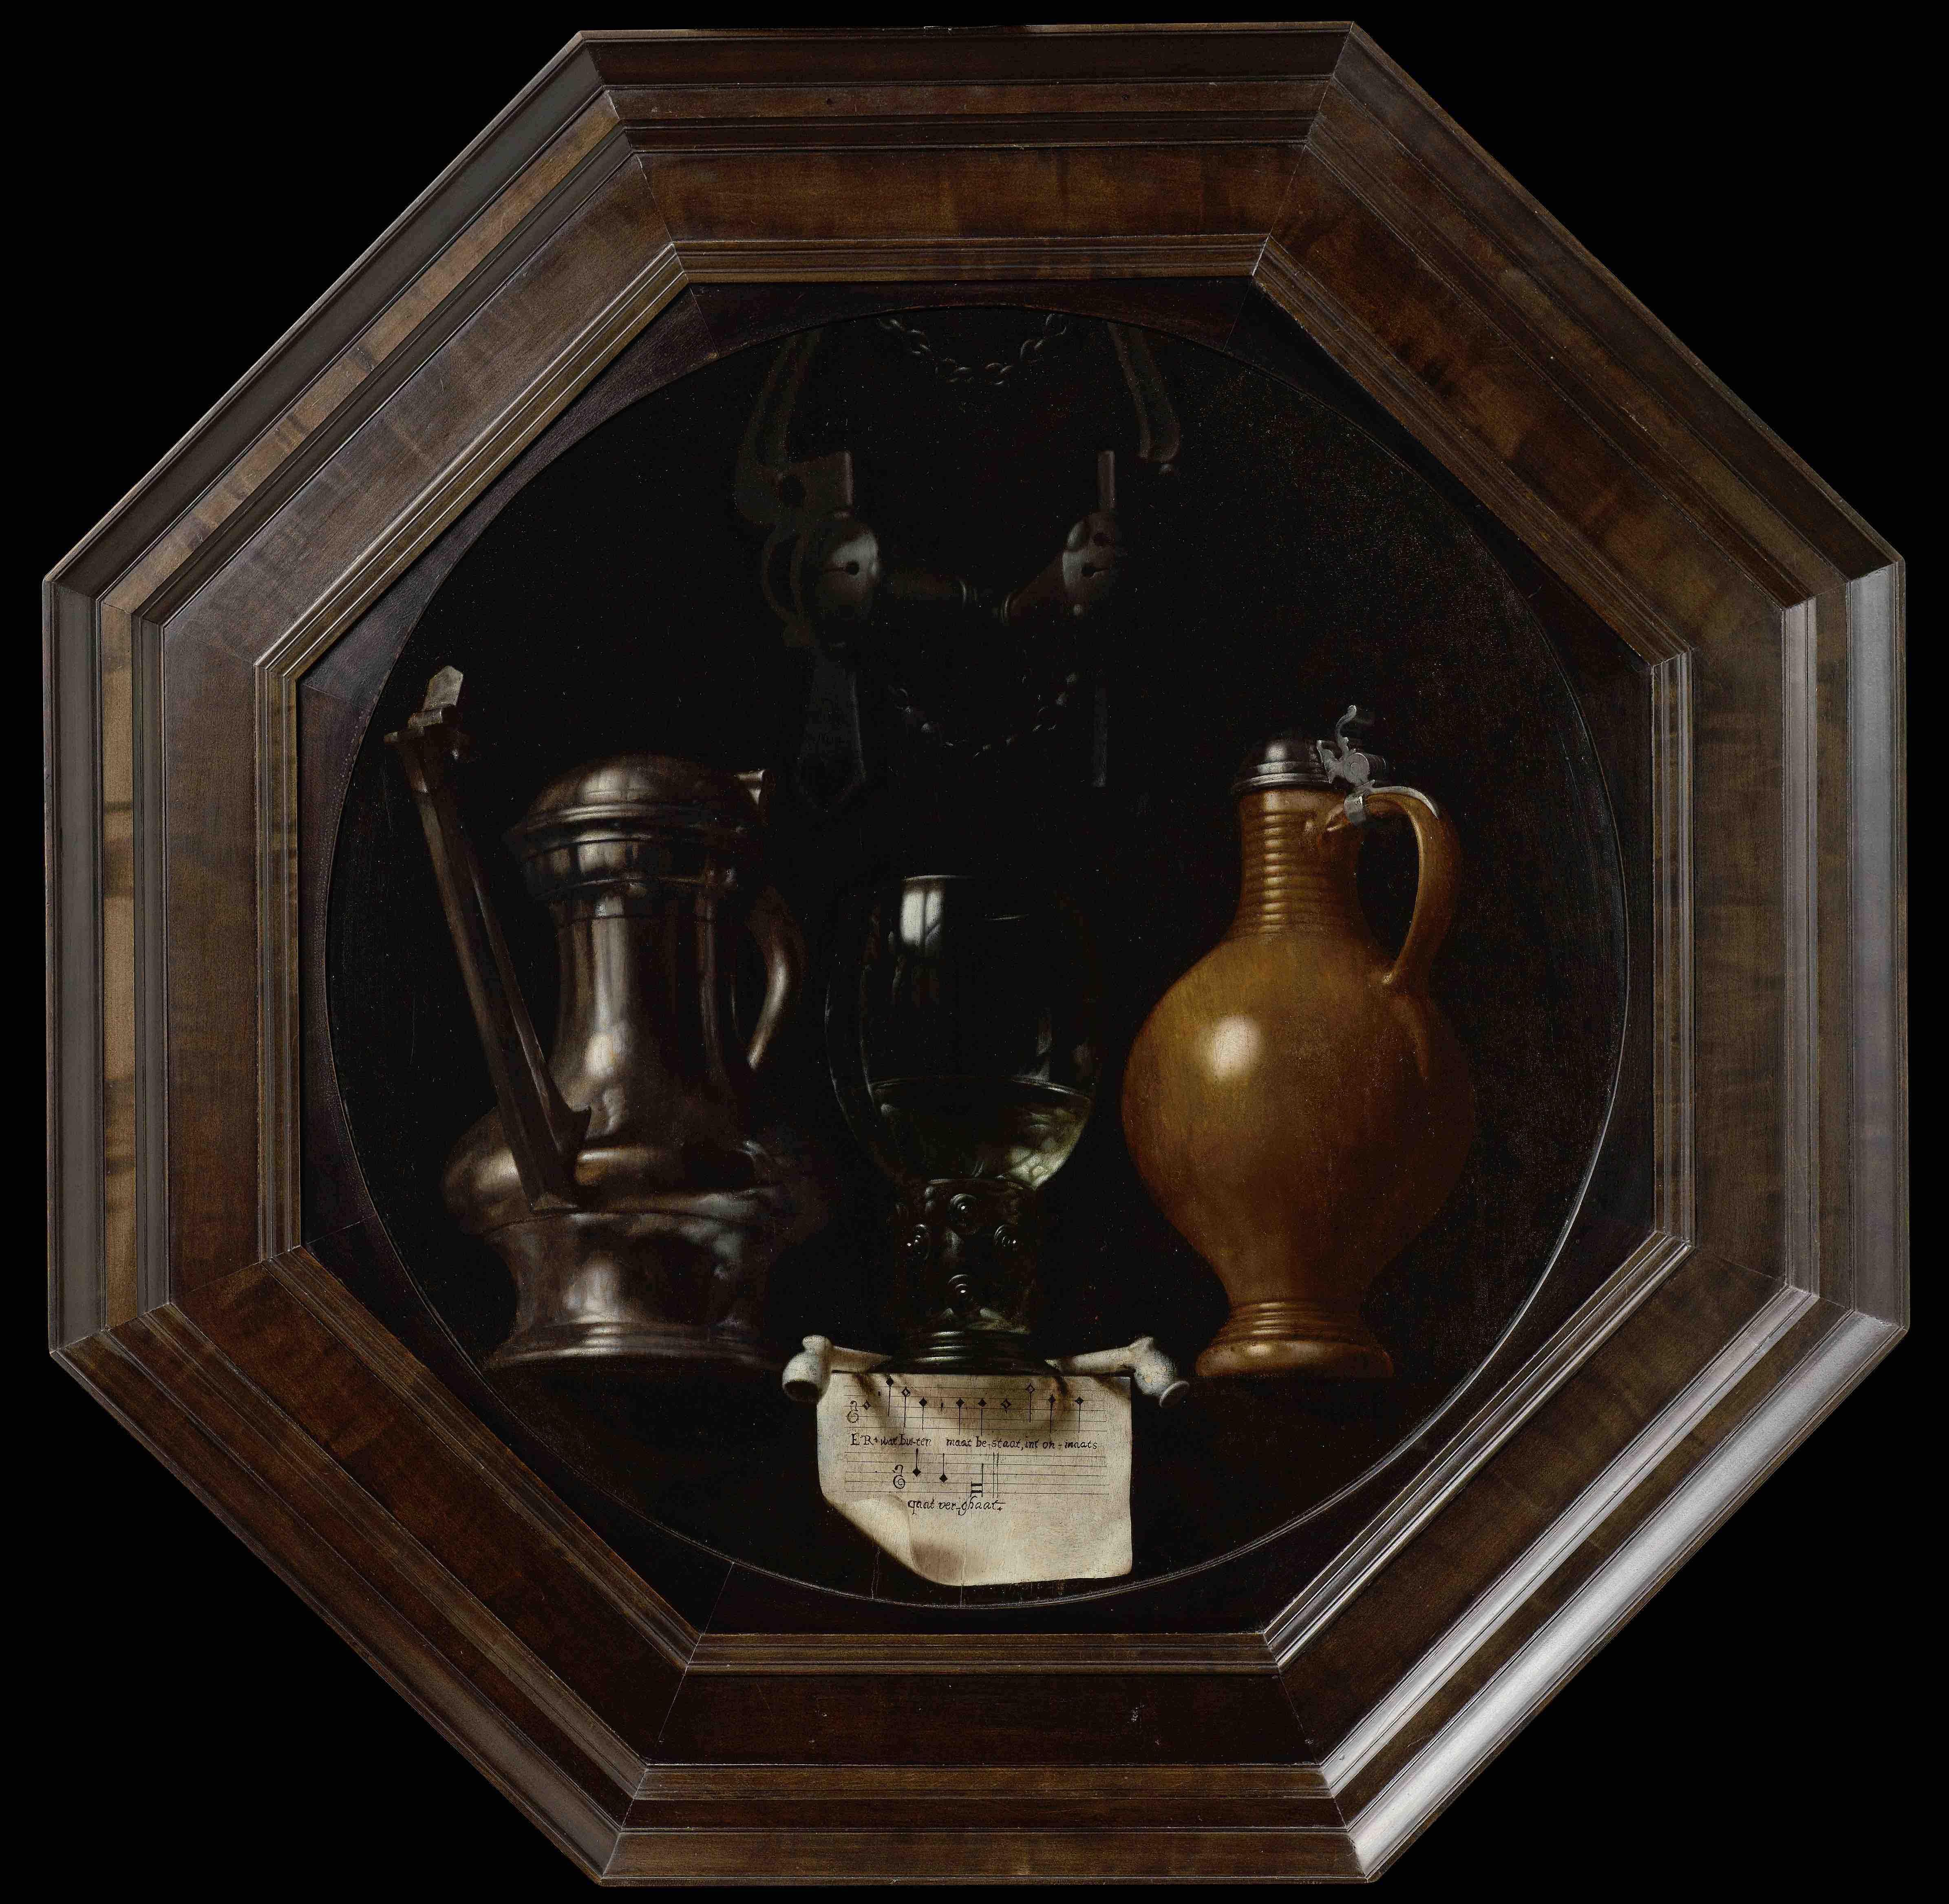 Johannes Torrentius, Emblematic Still Life, 1614